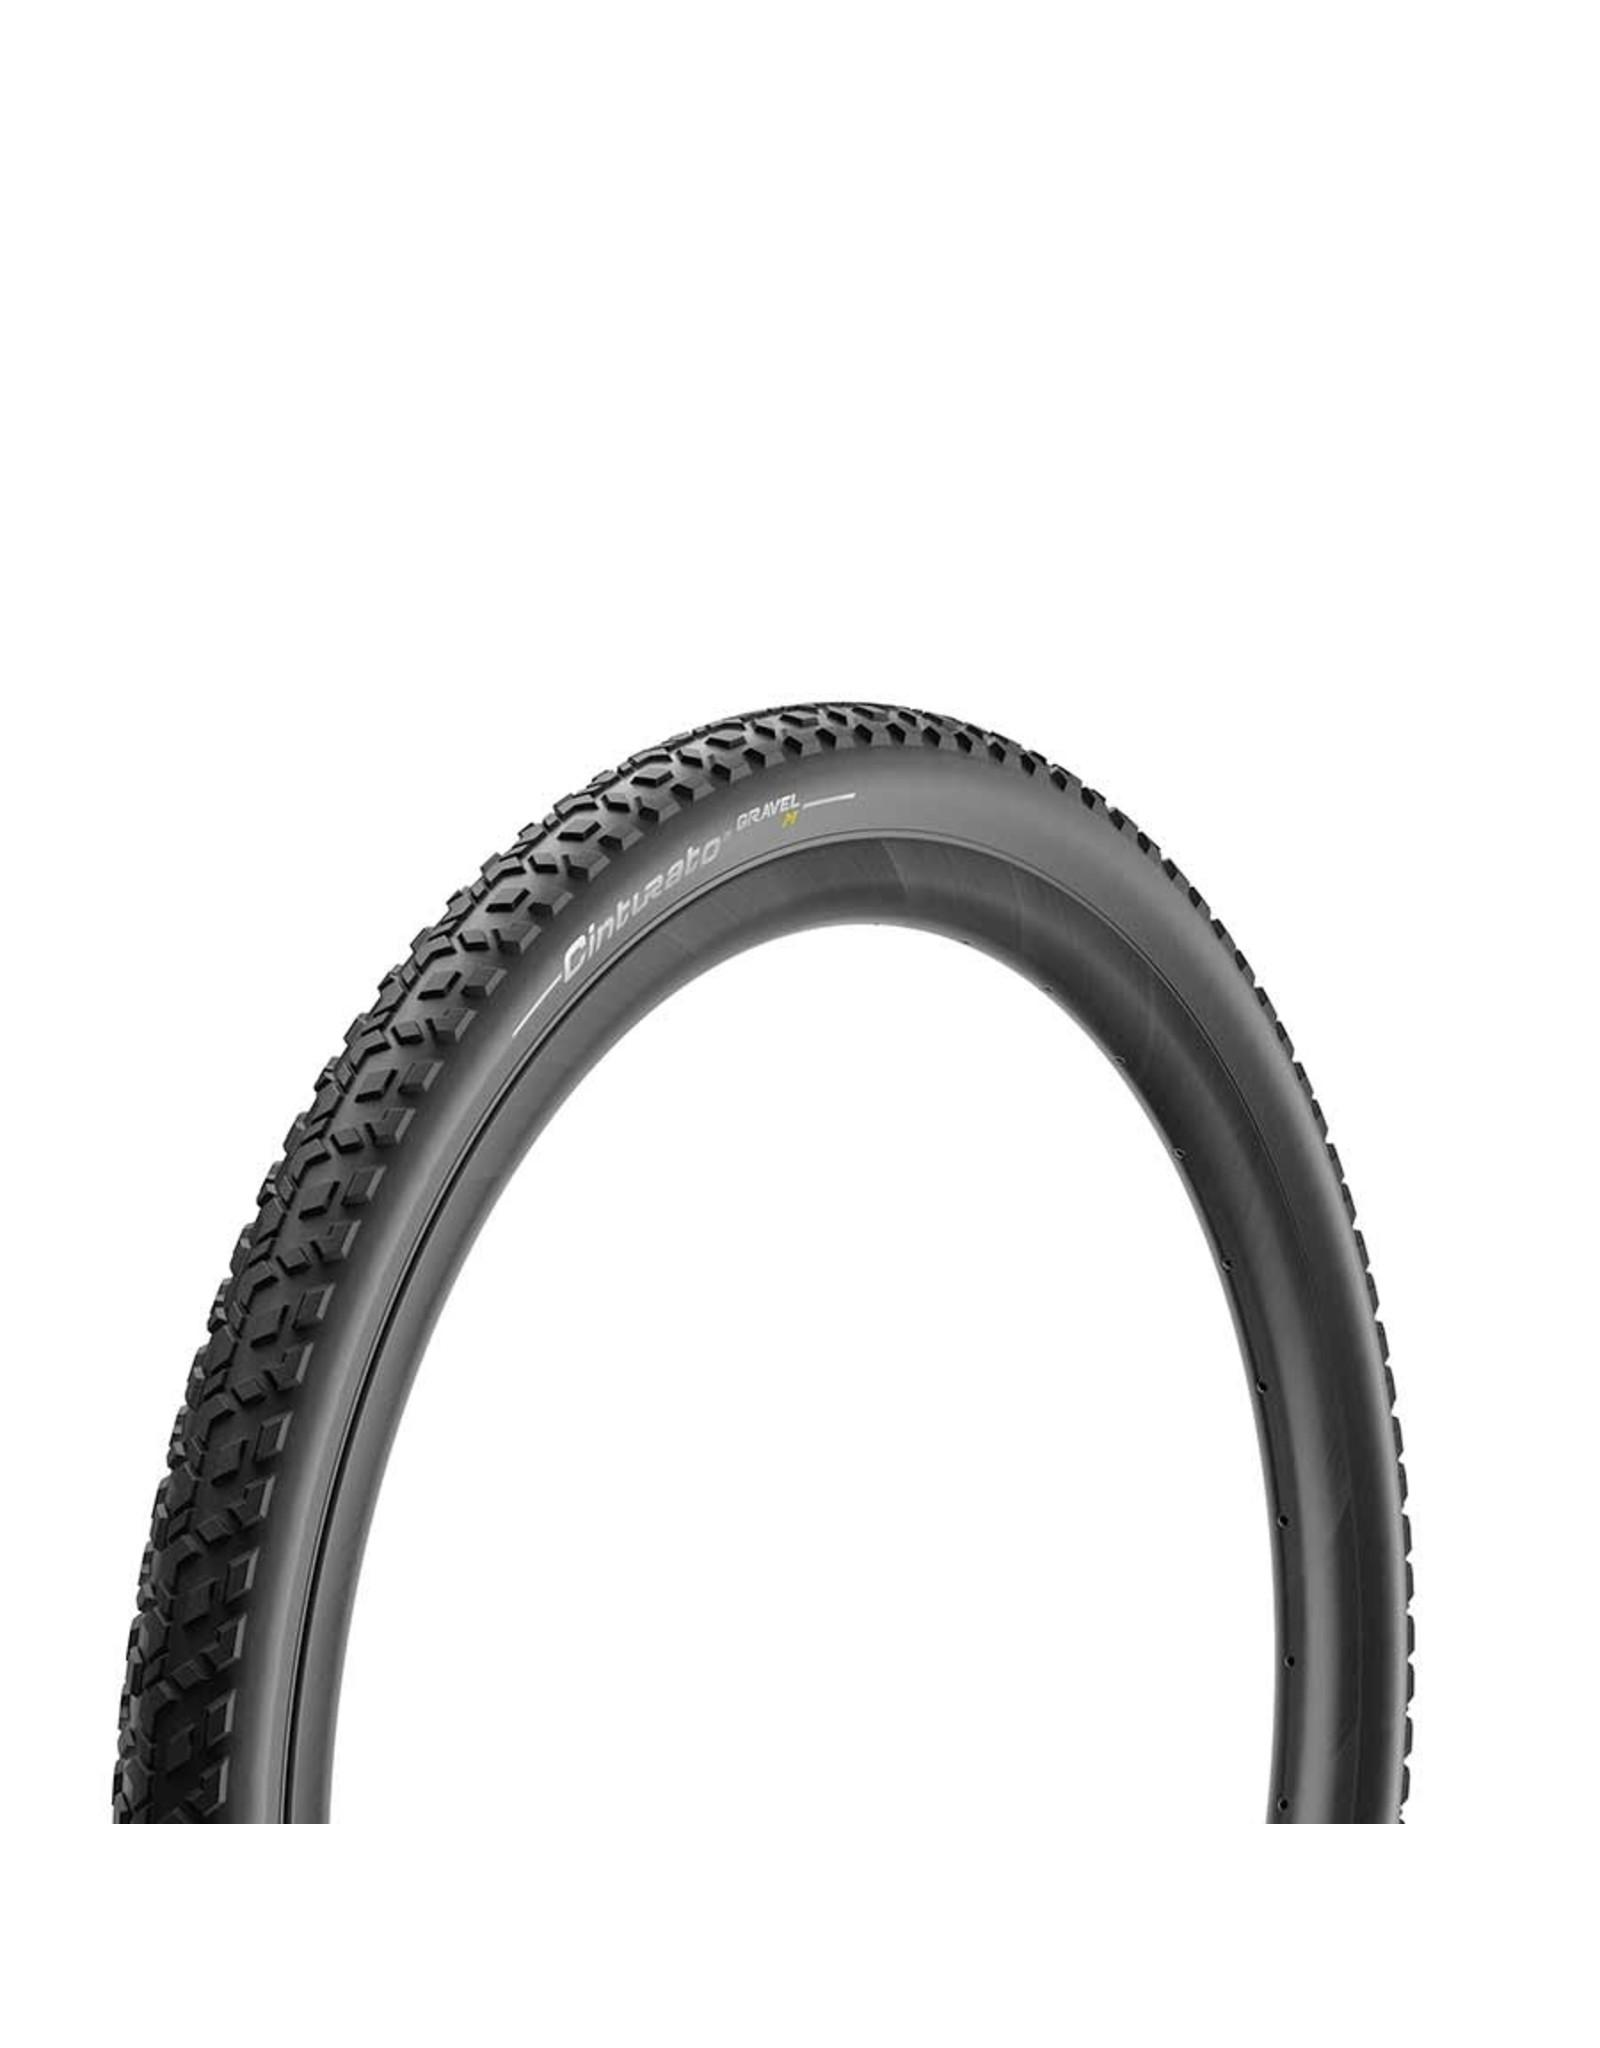 Pirelli, Cinturato Gravel M, Tire, 700x40C, Folding, Tubeless Ready, SpeedGrip, 127TPI, Black